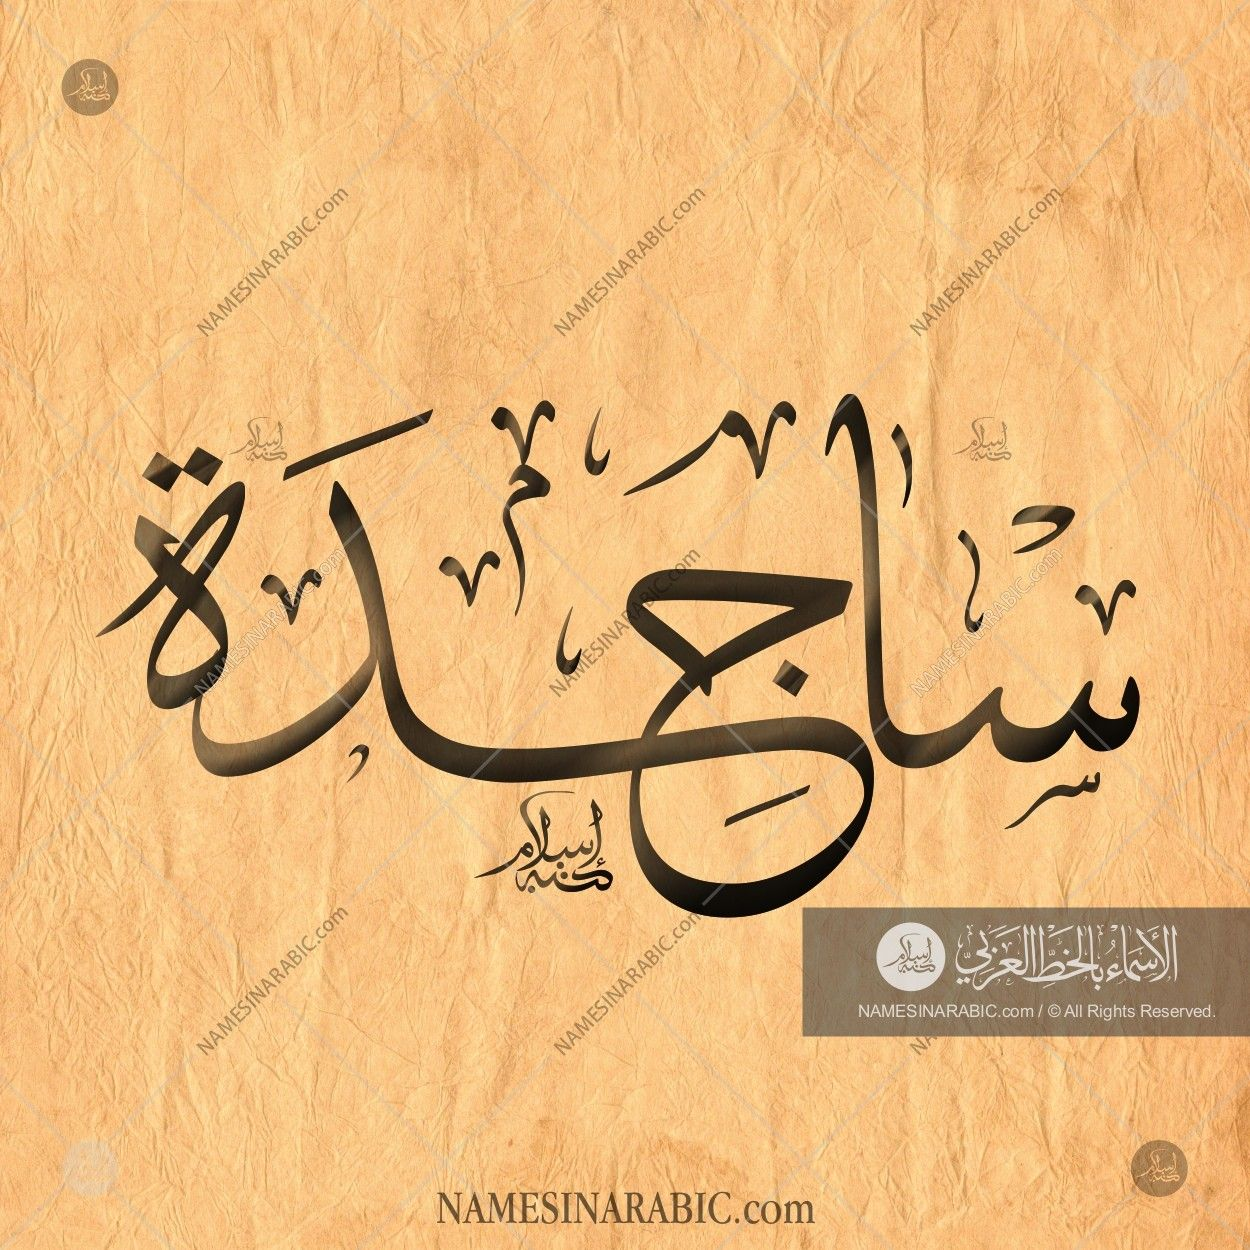 Sajidah ساجدة Names In Arabic Calligraphy Name 1679 Calligraphy Name Calligraphy Names